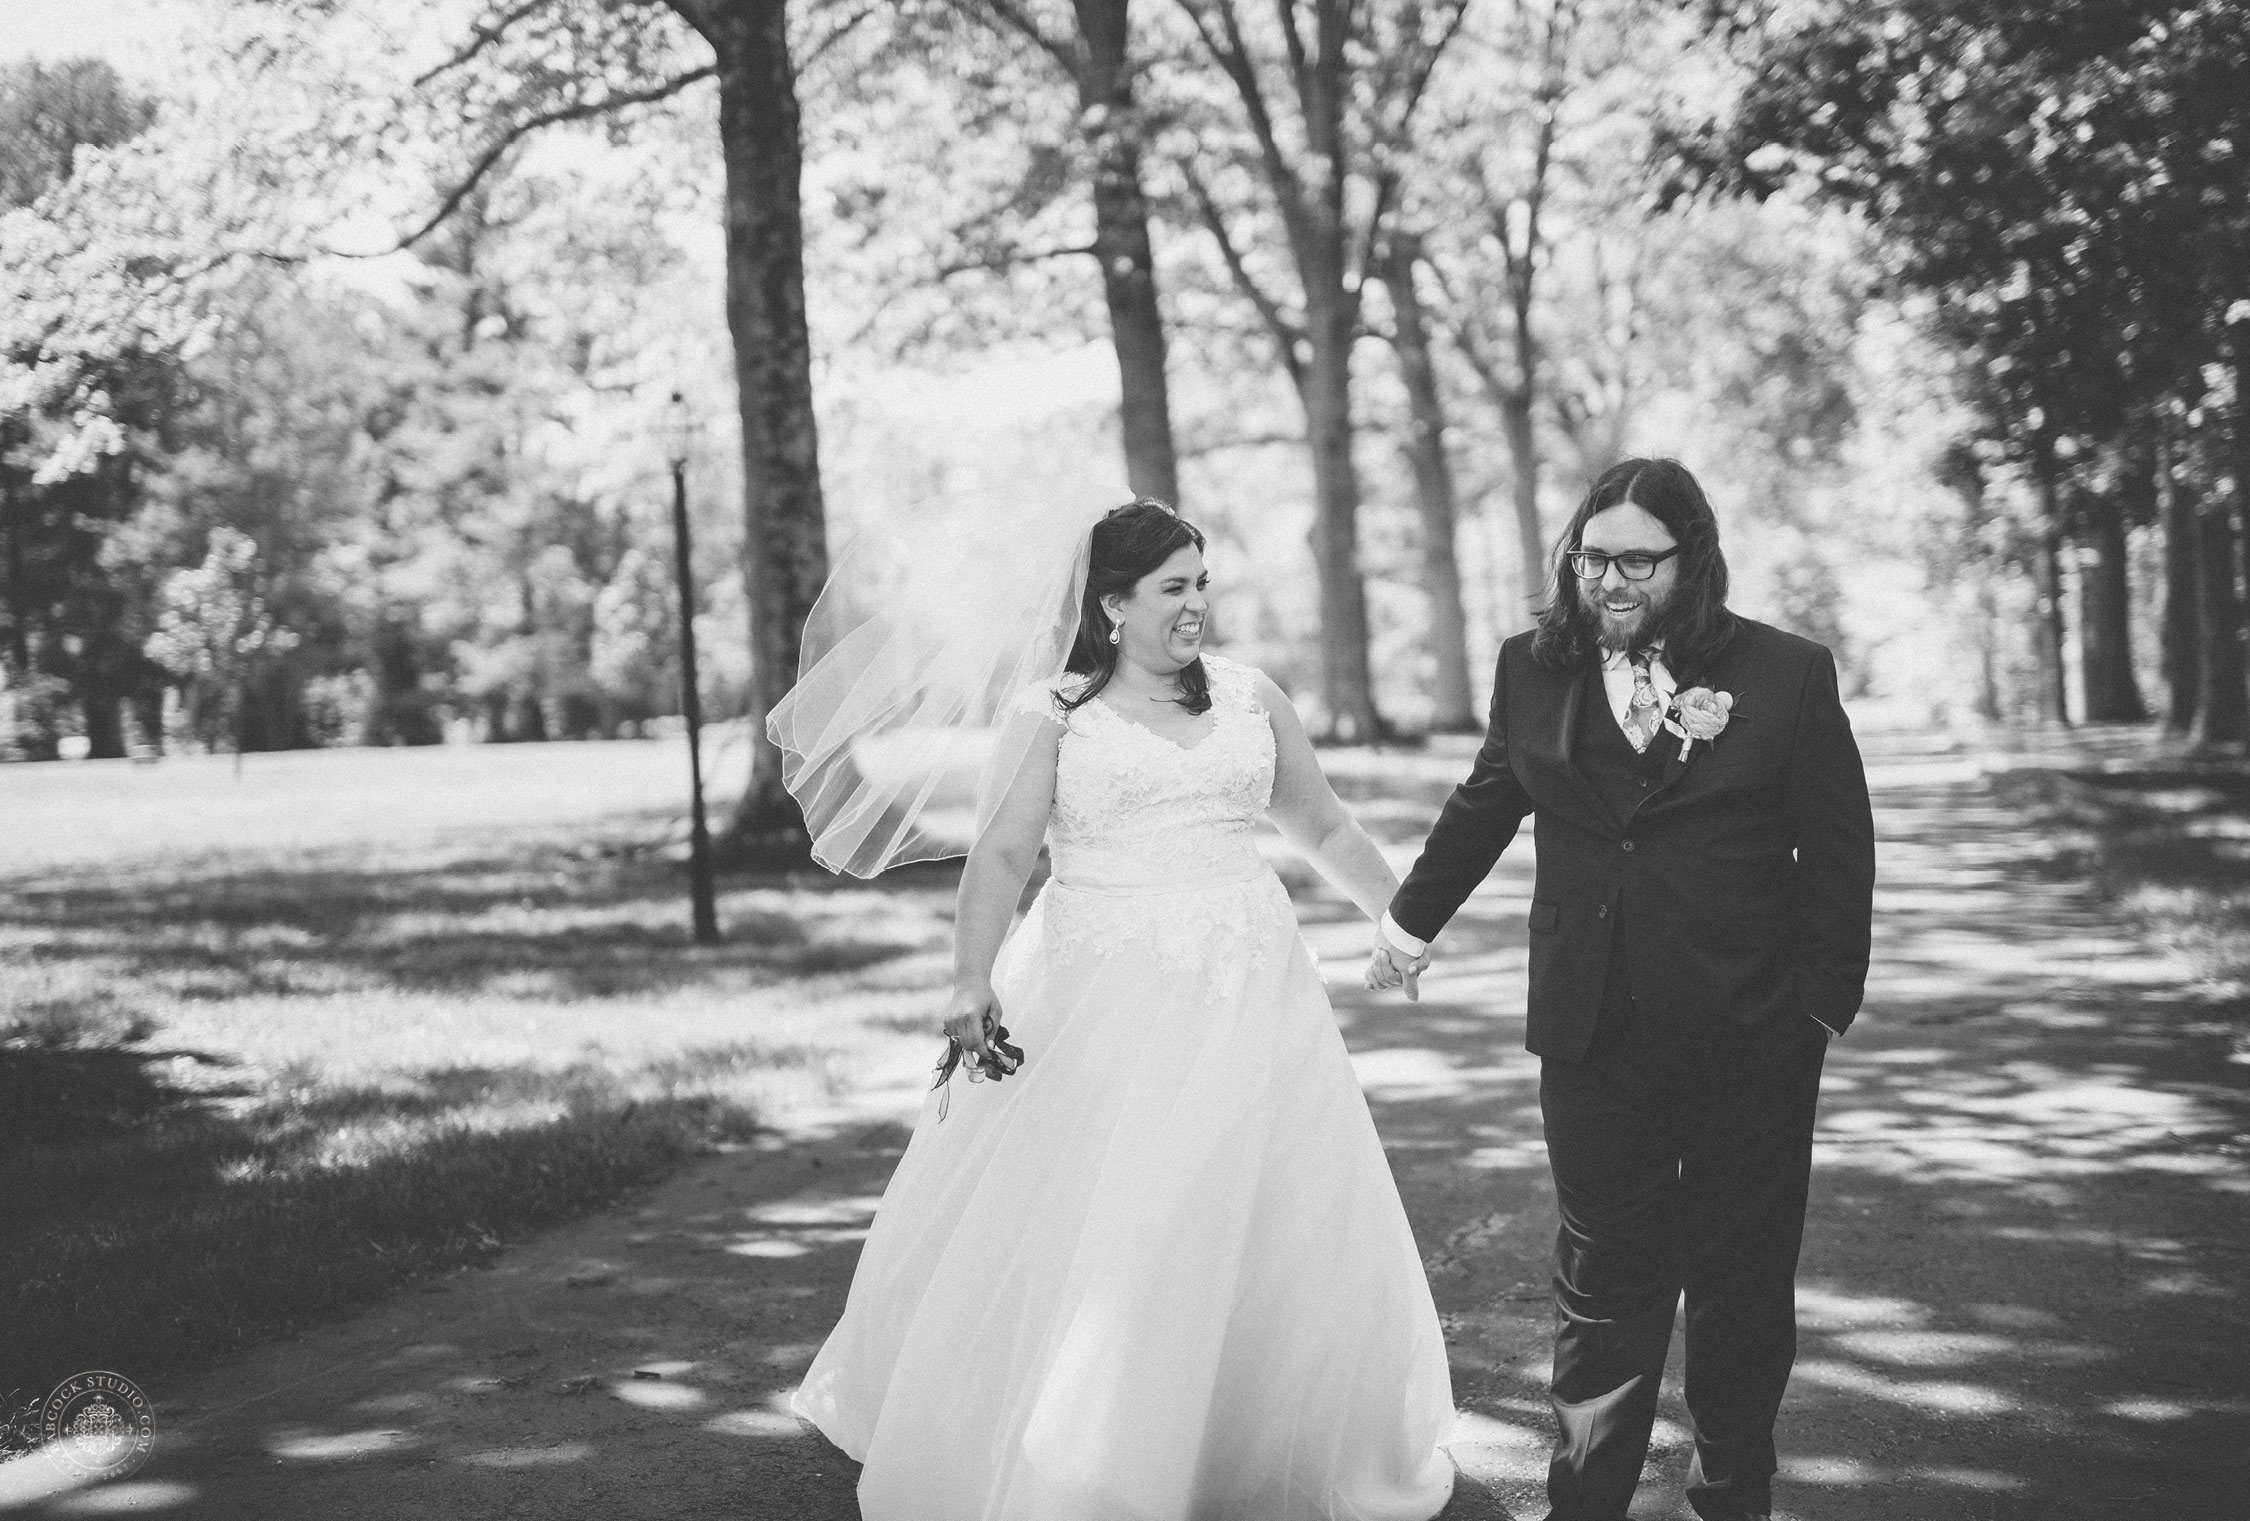 nicole-brendarn-school-house-wedding-photographer-dayton-ohio-14.jpg